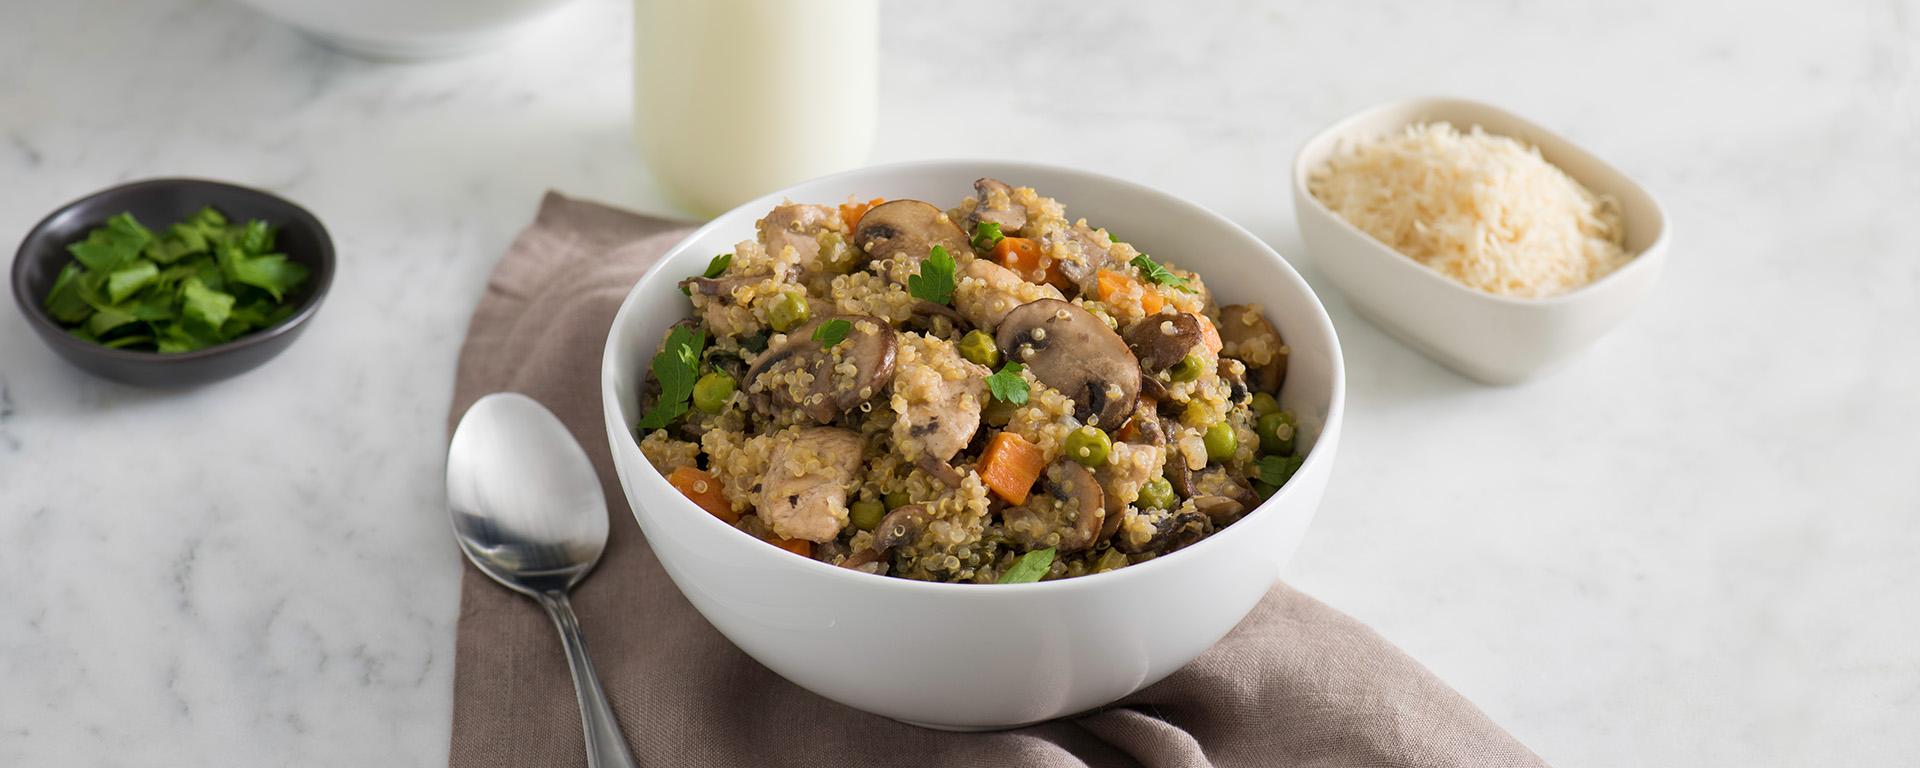 Photo for - Mushroom and Spinach Quinoa Risotto